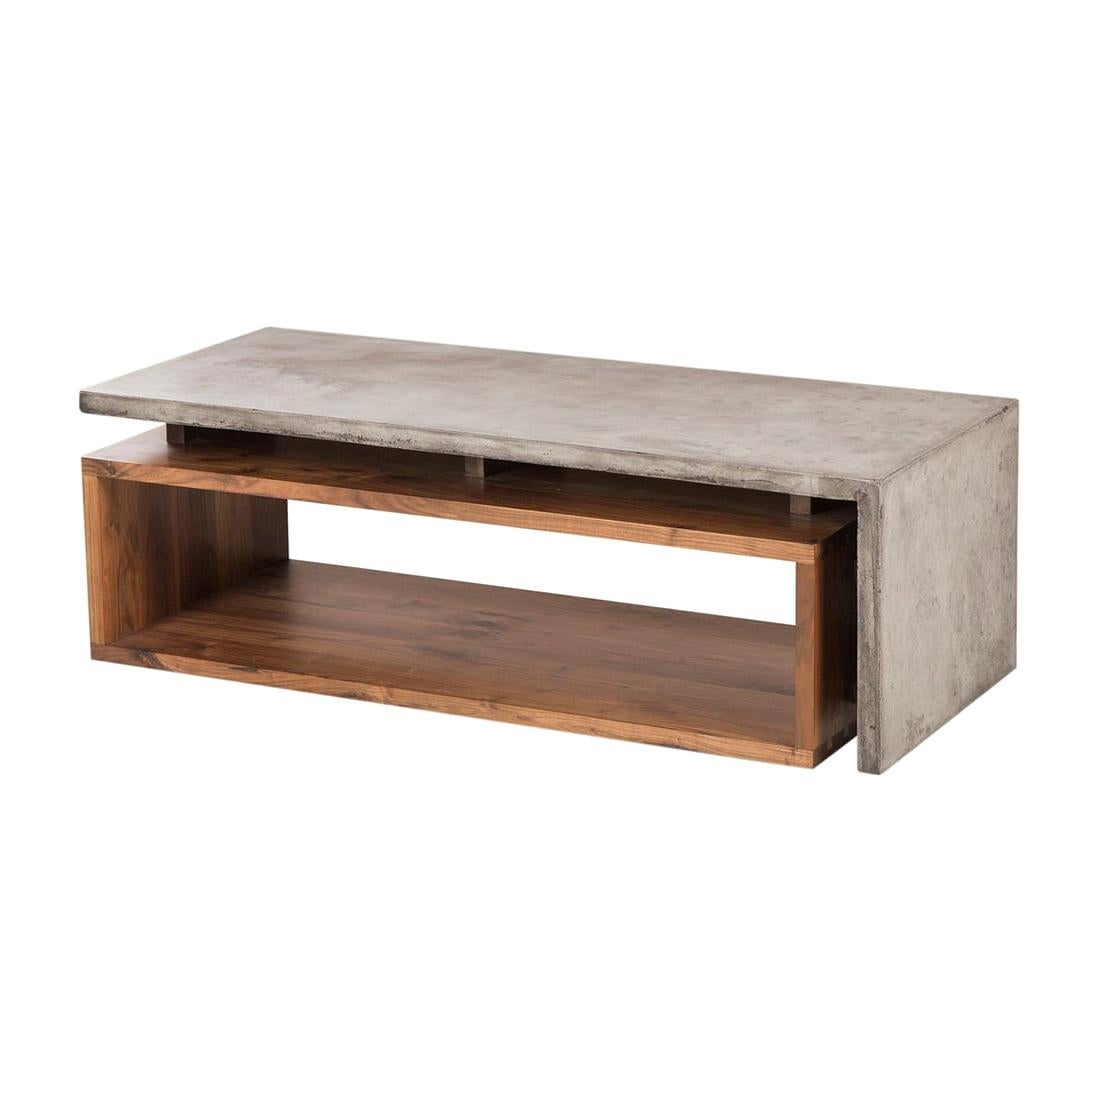 Half Concrete Coffee Table